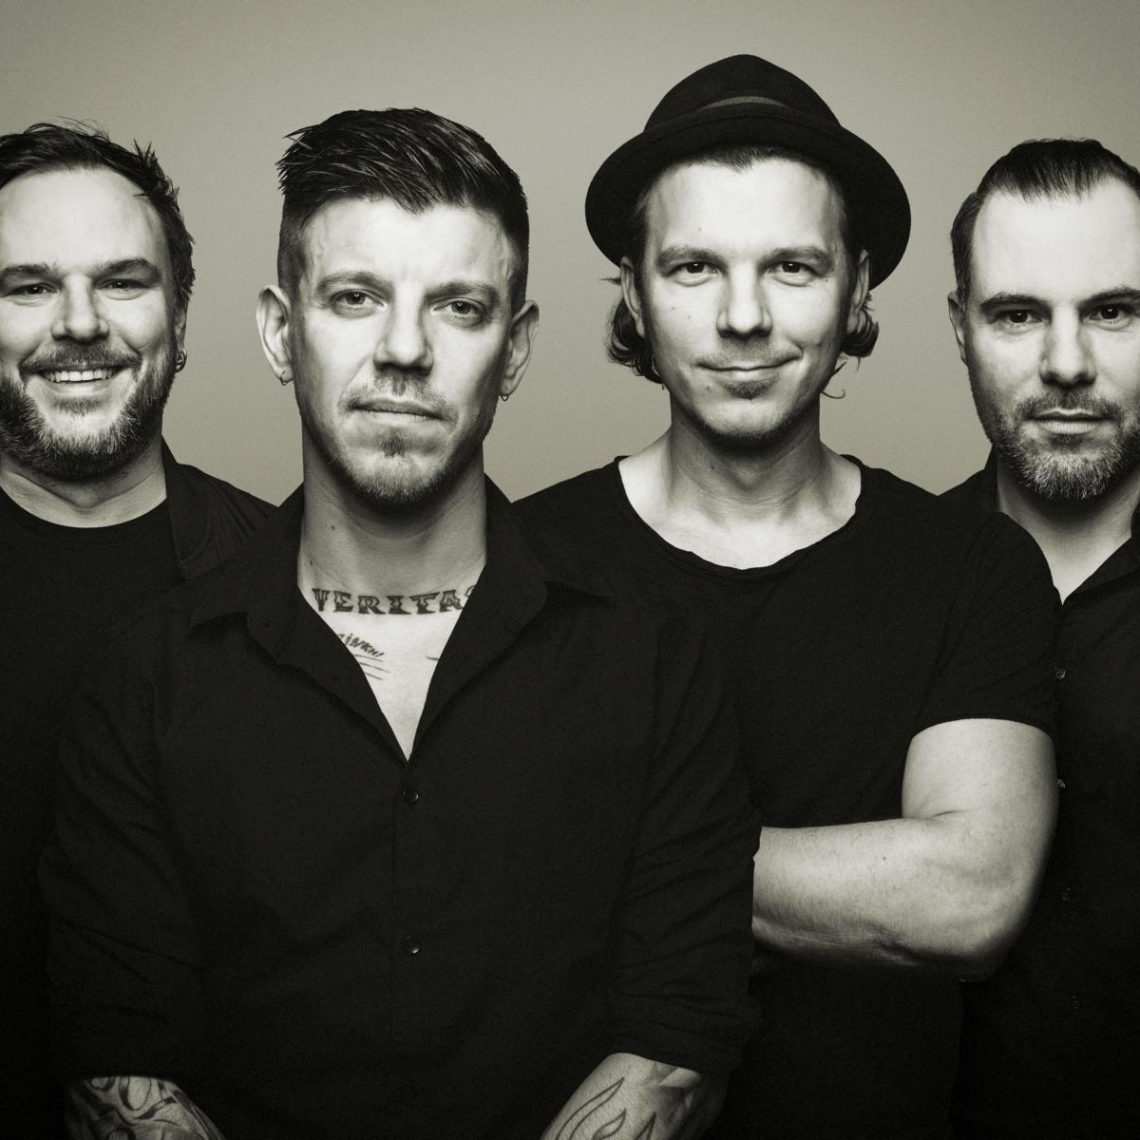 SERUM 114 Announces New Album, Im Zeichen der Zeit and Releases New Single and Official Video